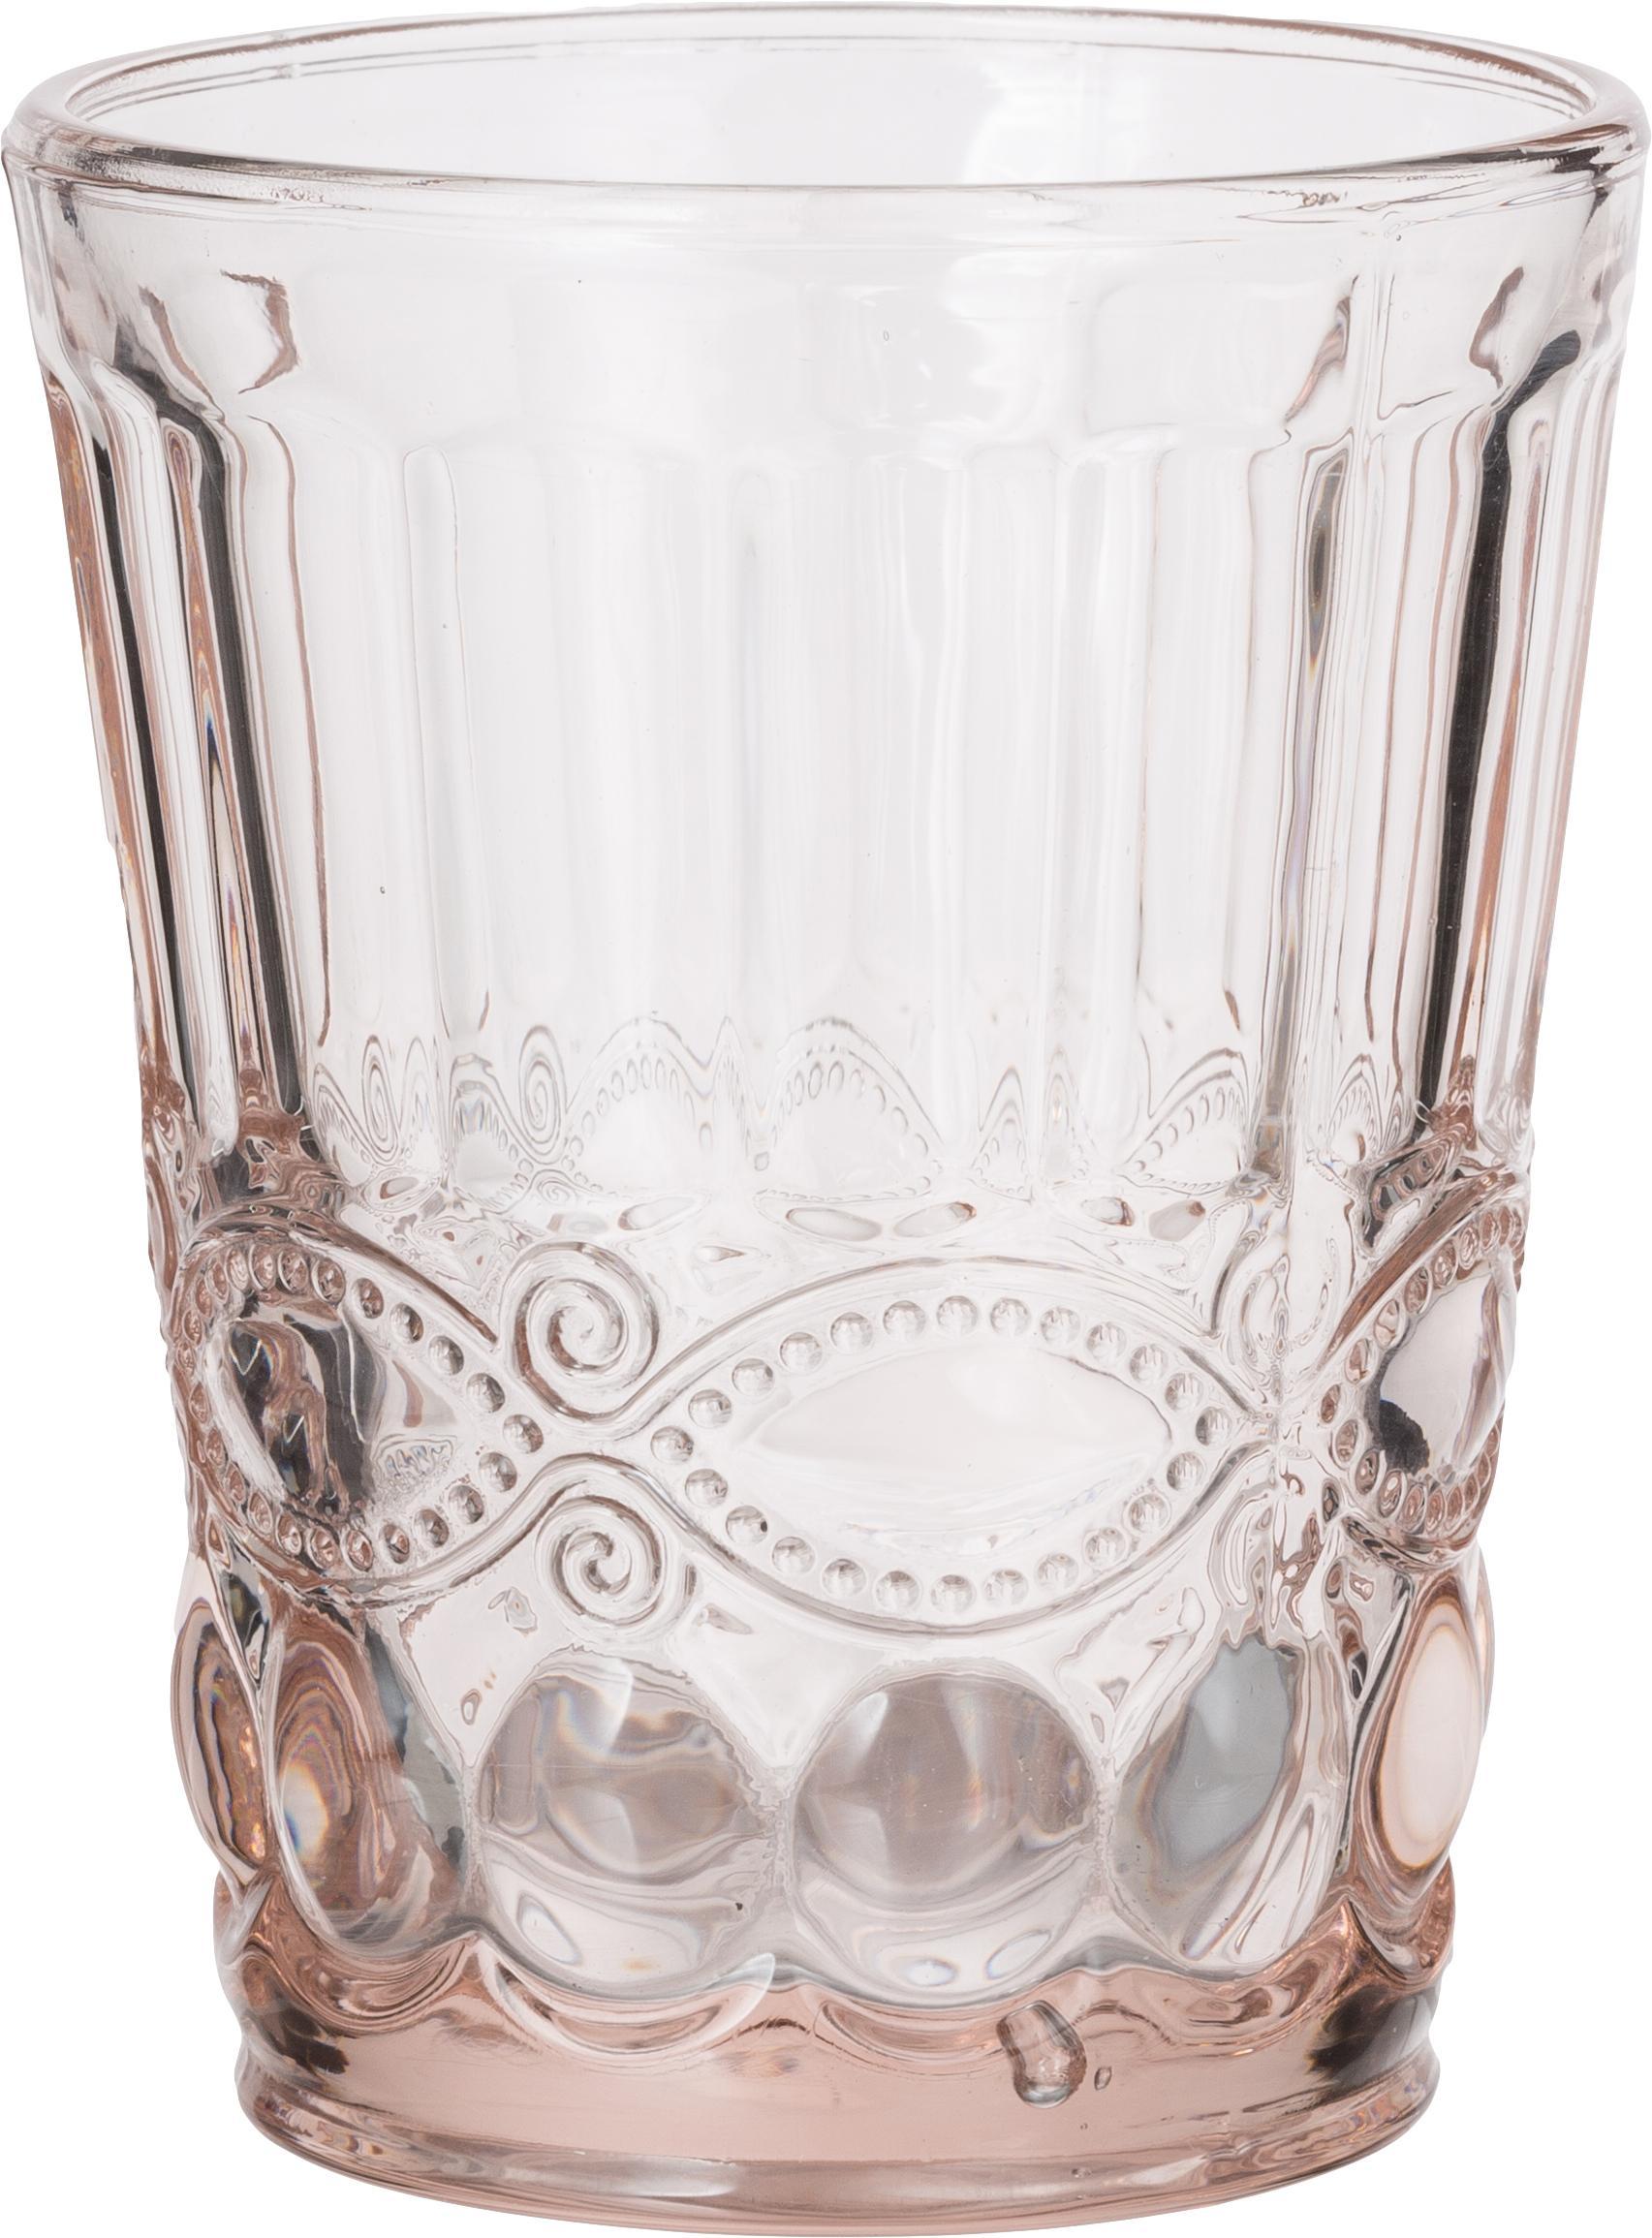 Waterglazen Solange, 6 stuks, Glas, Transparant, roze, 265 ml